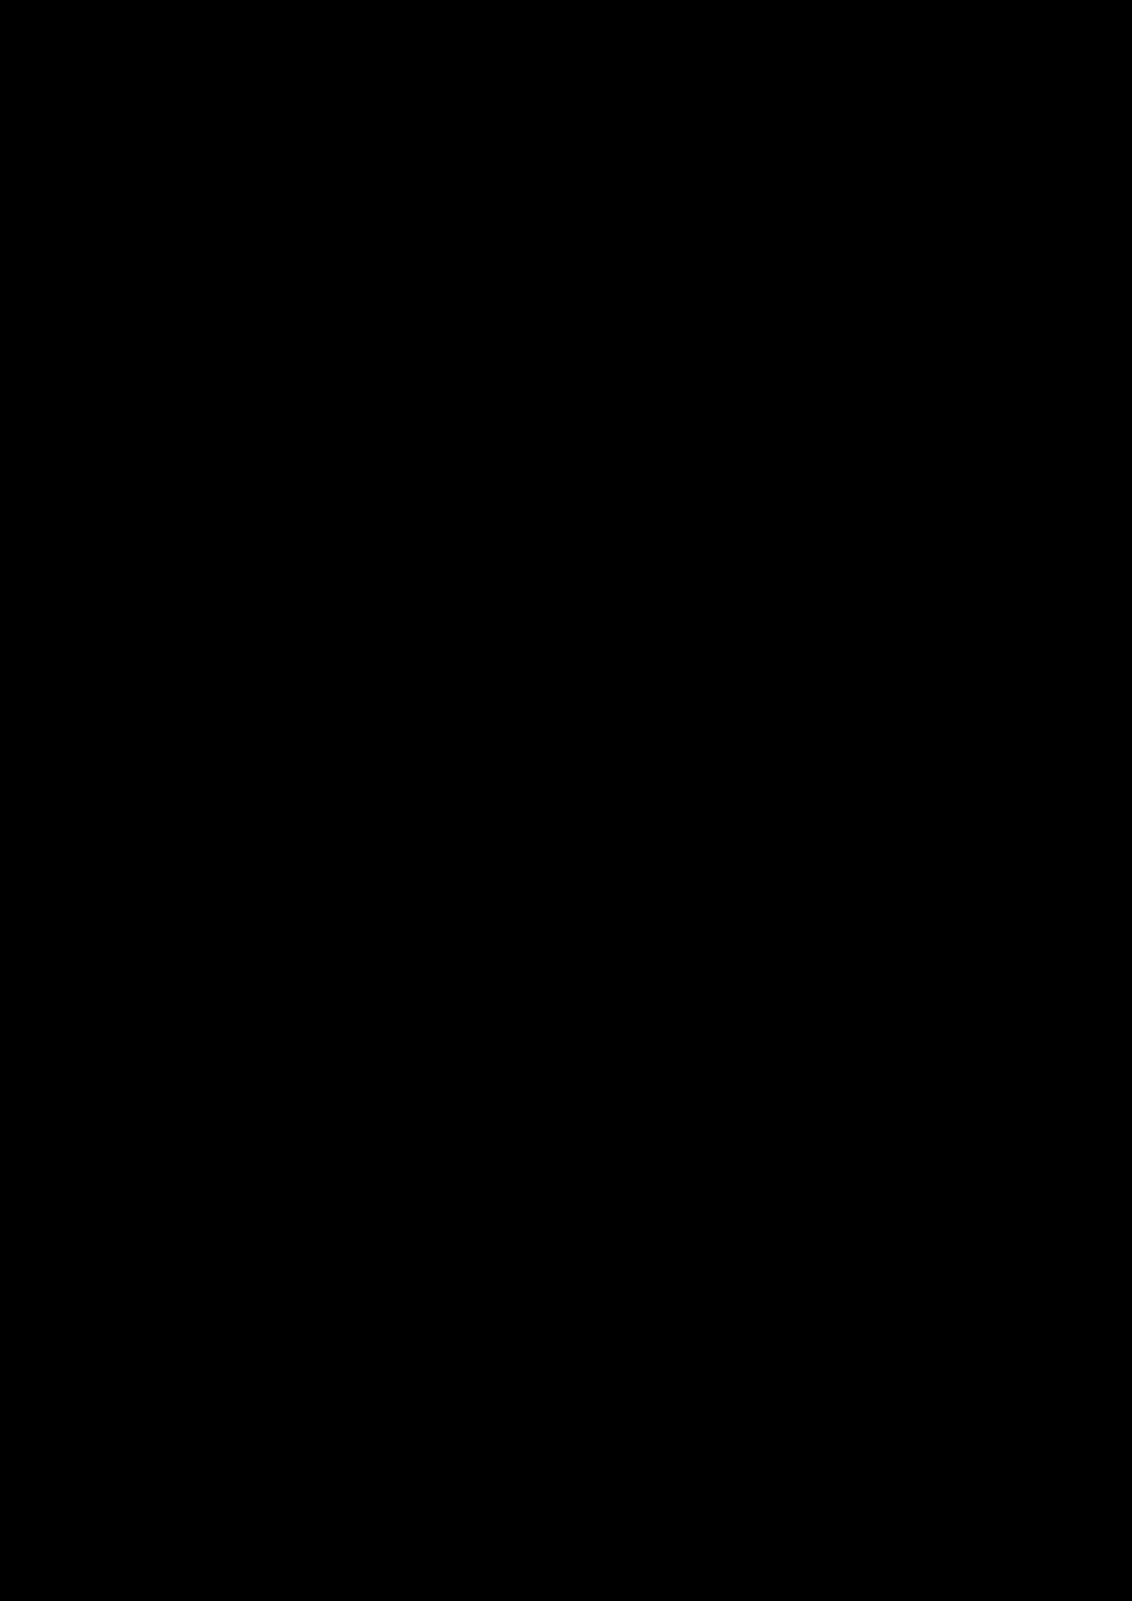 Prosti slide, Image 31